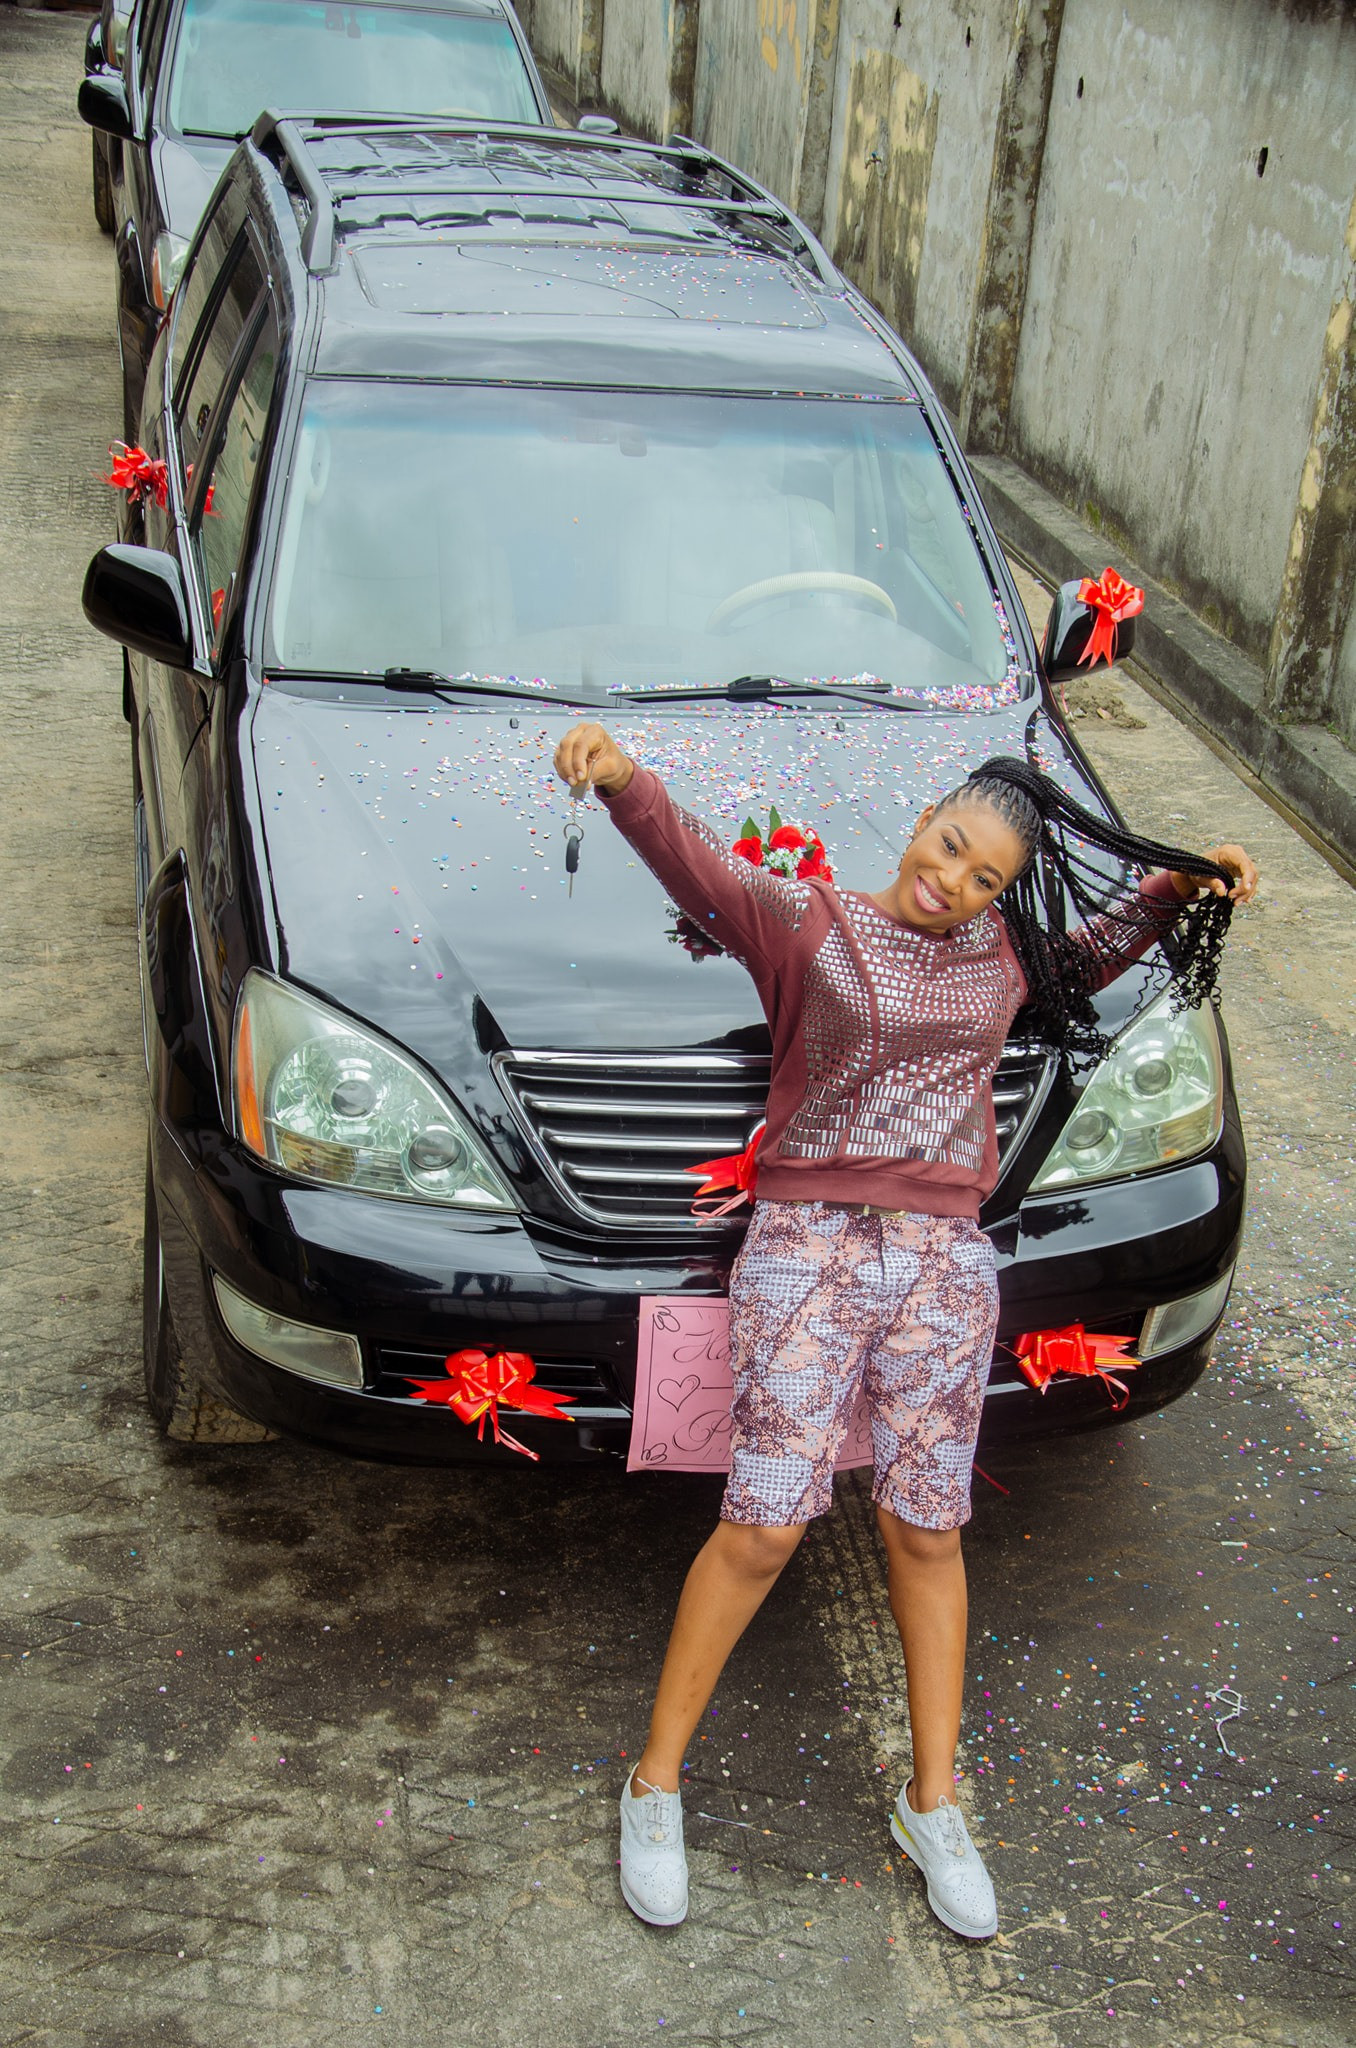 Pastor Wife Wedding Anniversary Car